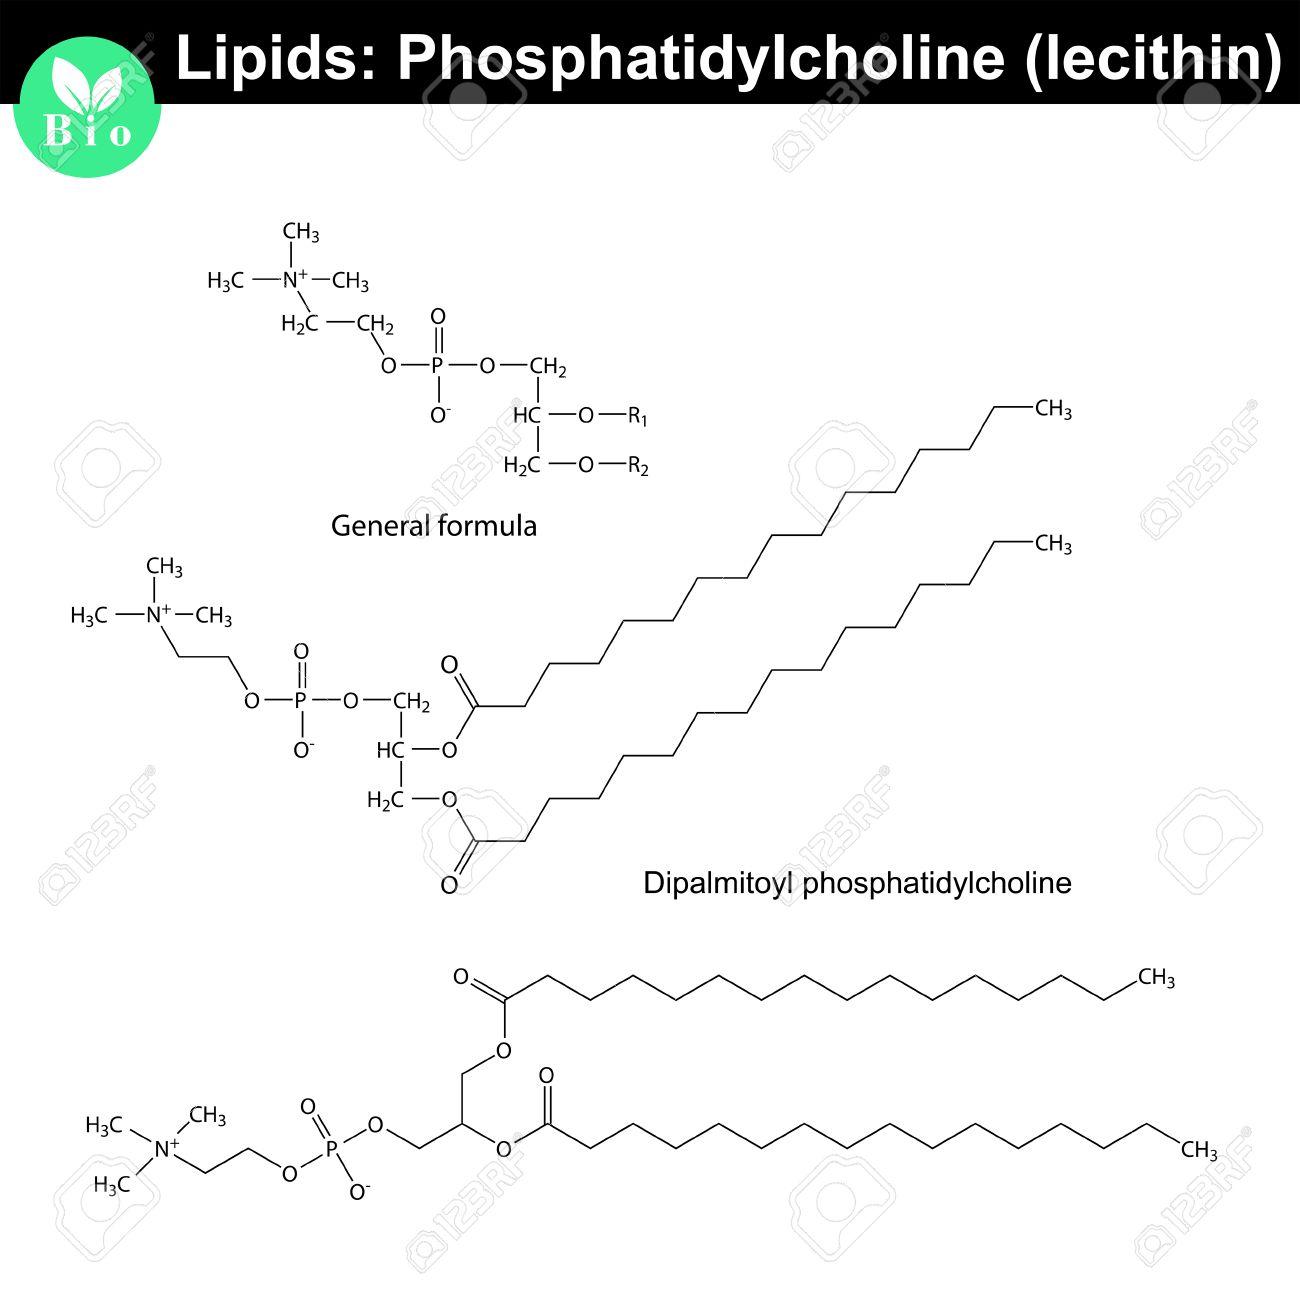 lecithin molecular structure chemical formulas of lipids